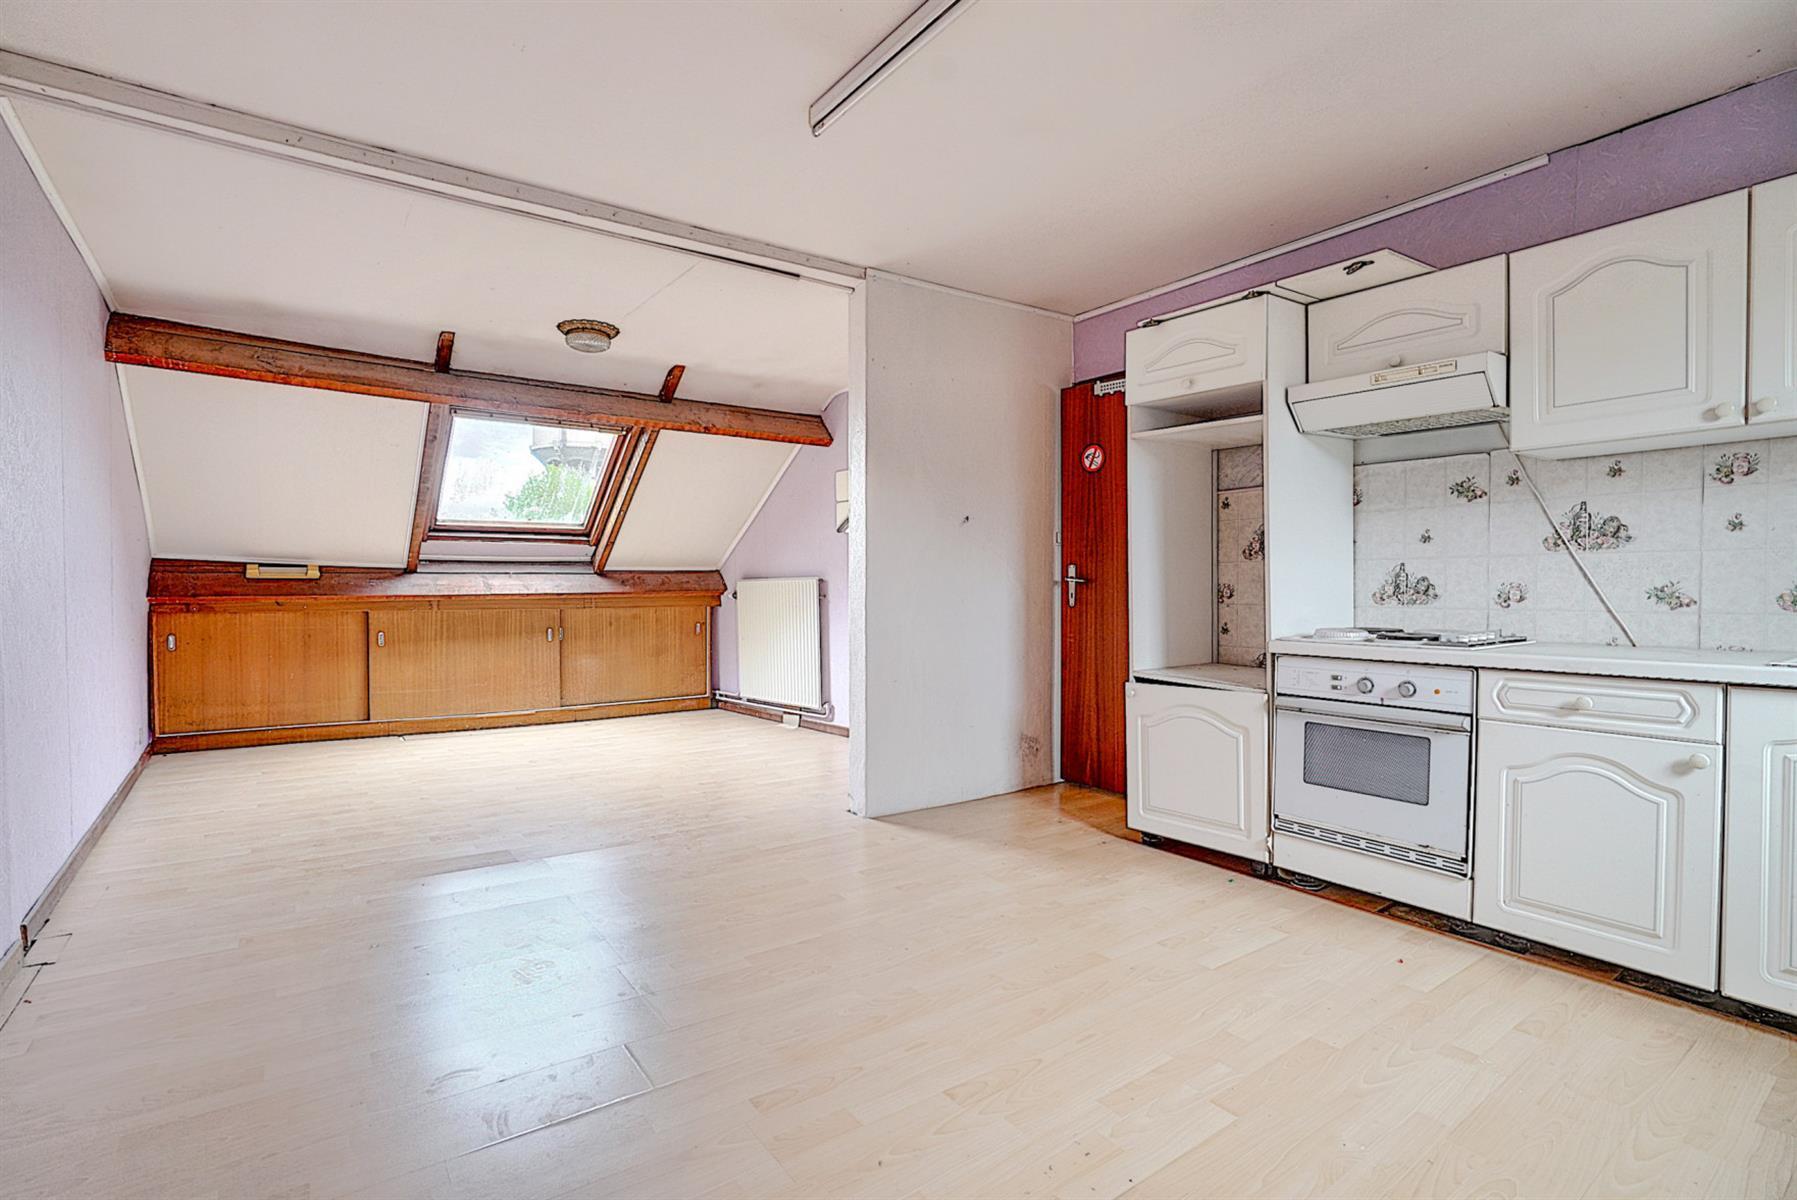 Maison - Saint-nicolas - #4357054-13